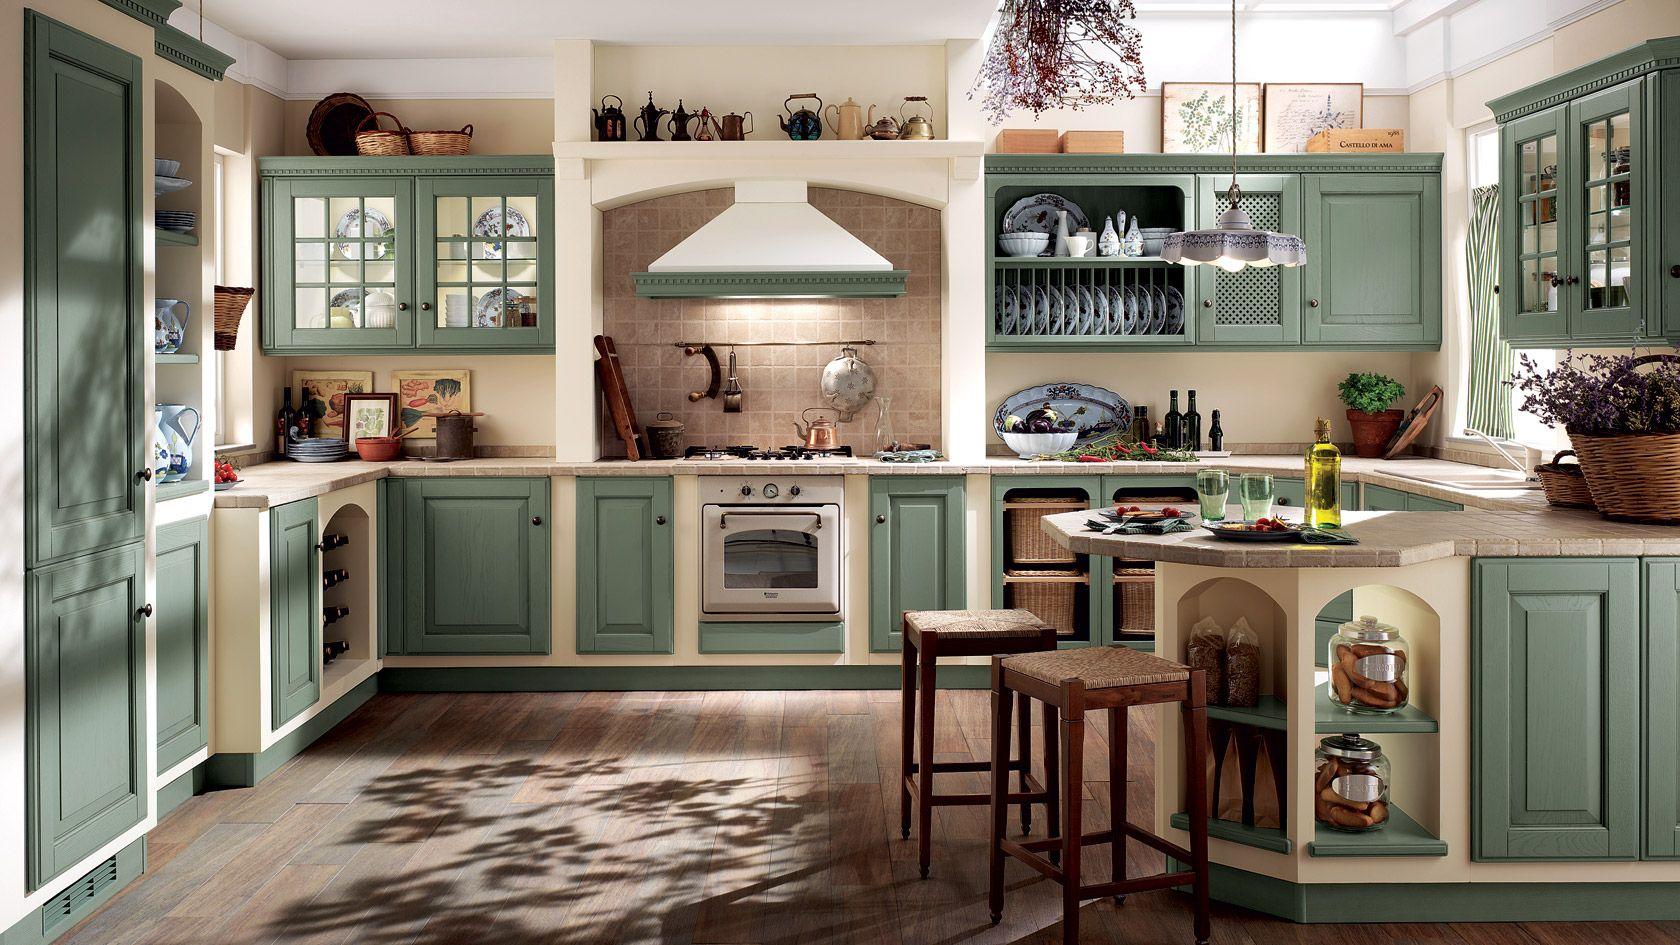 cucina baltimora scavolini penisola | cucine logiche | pinterest, Hause ideen